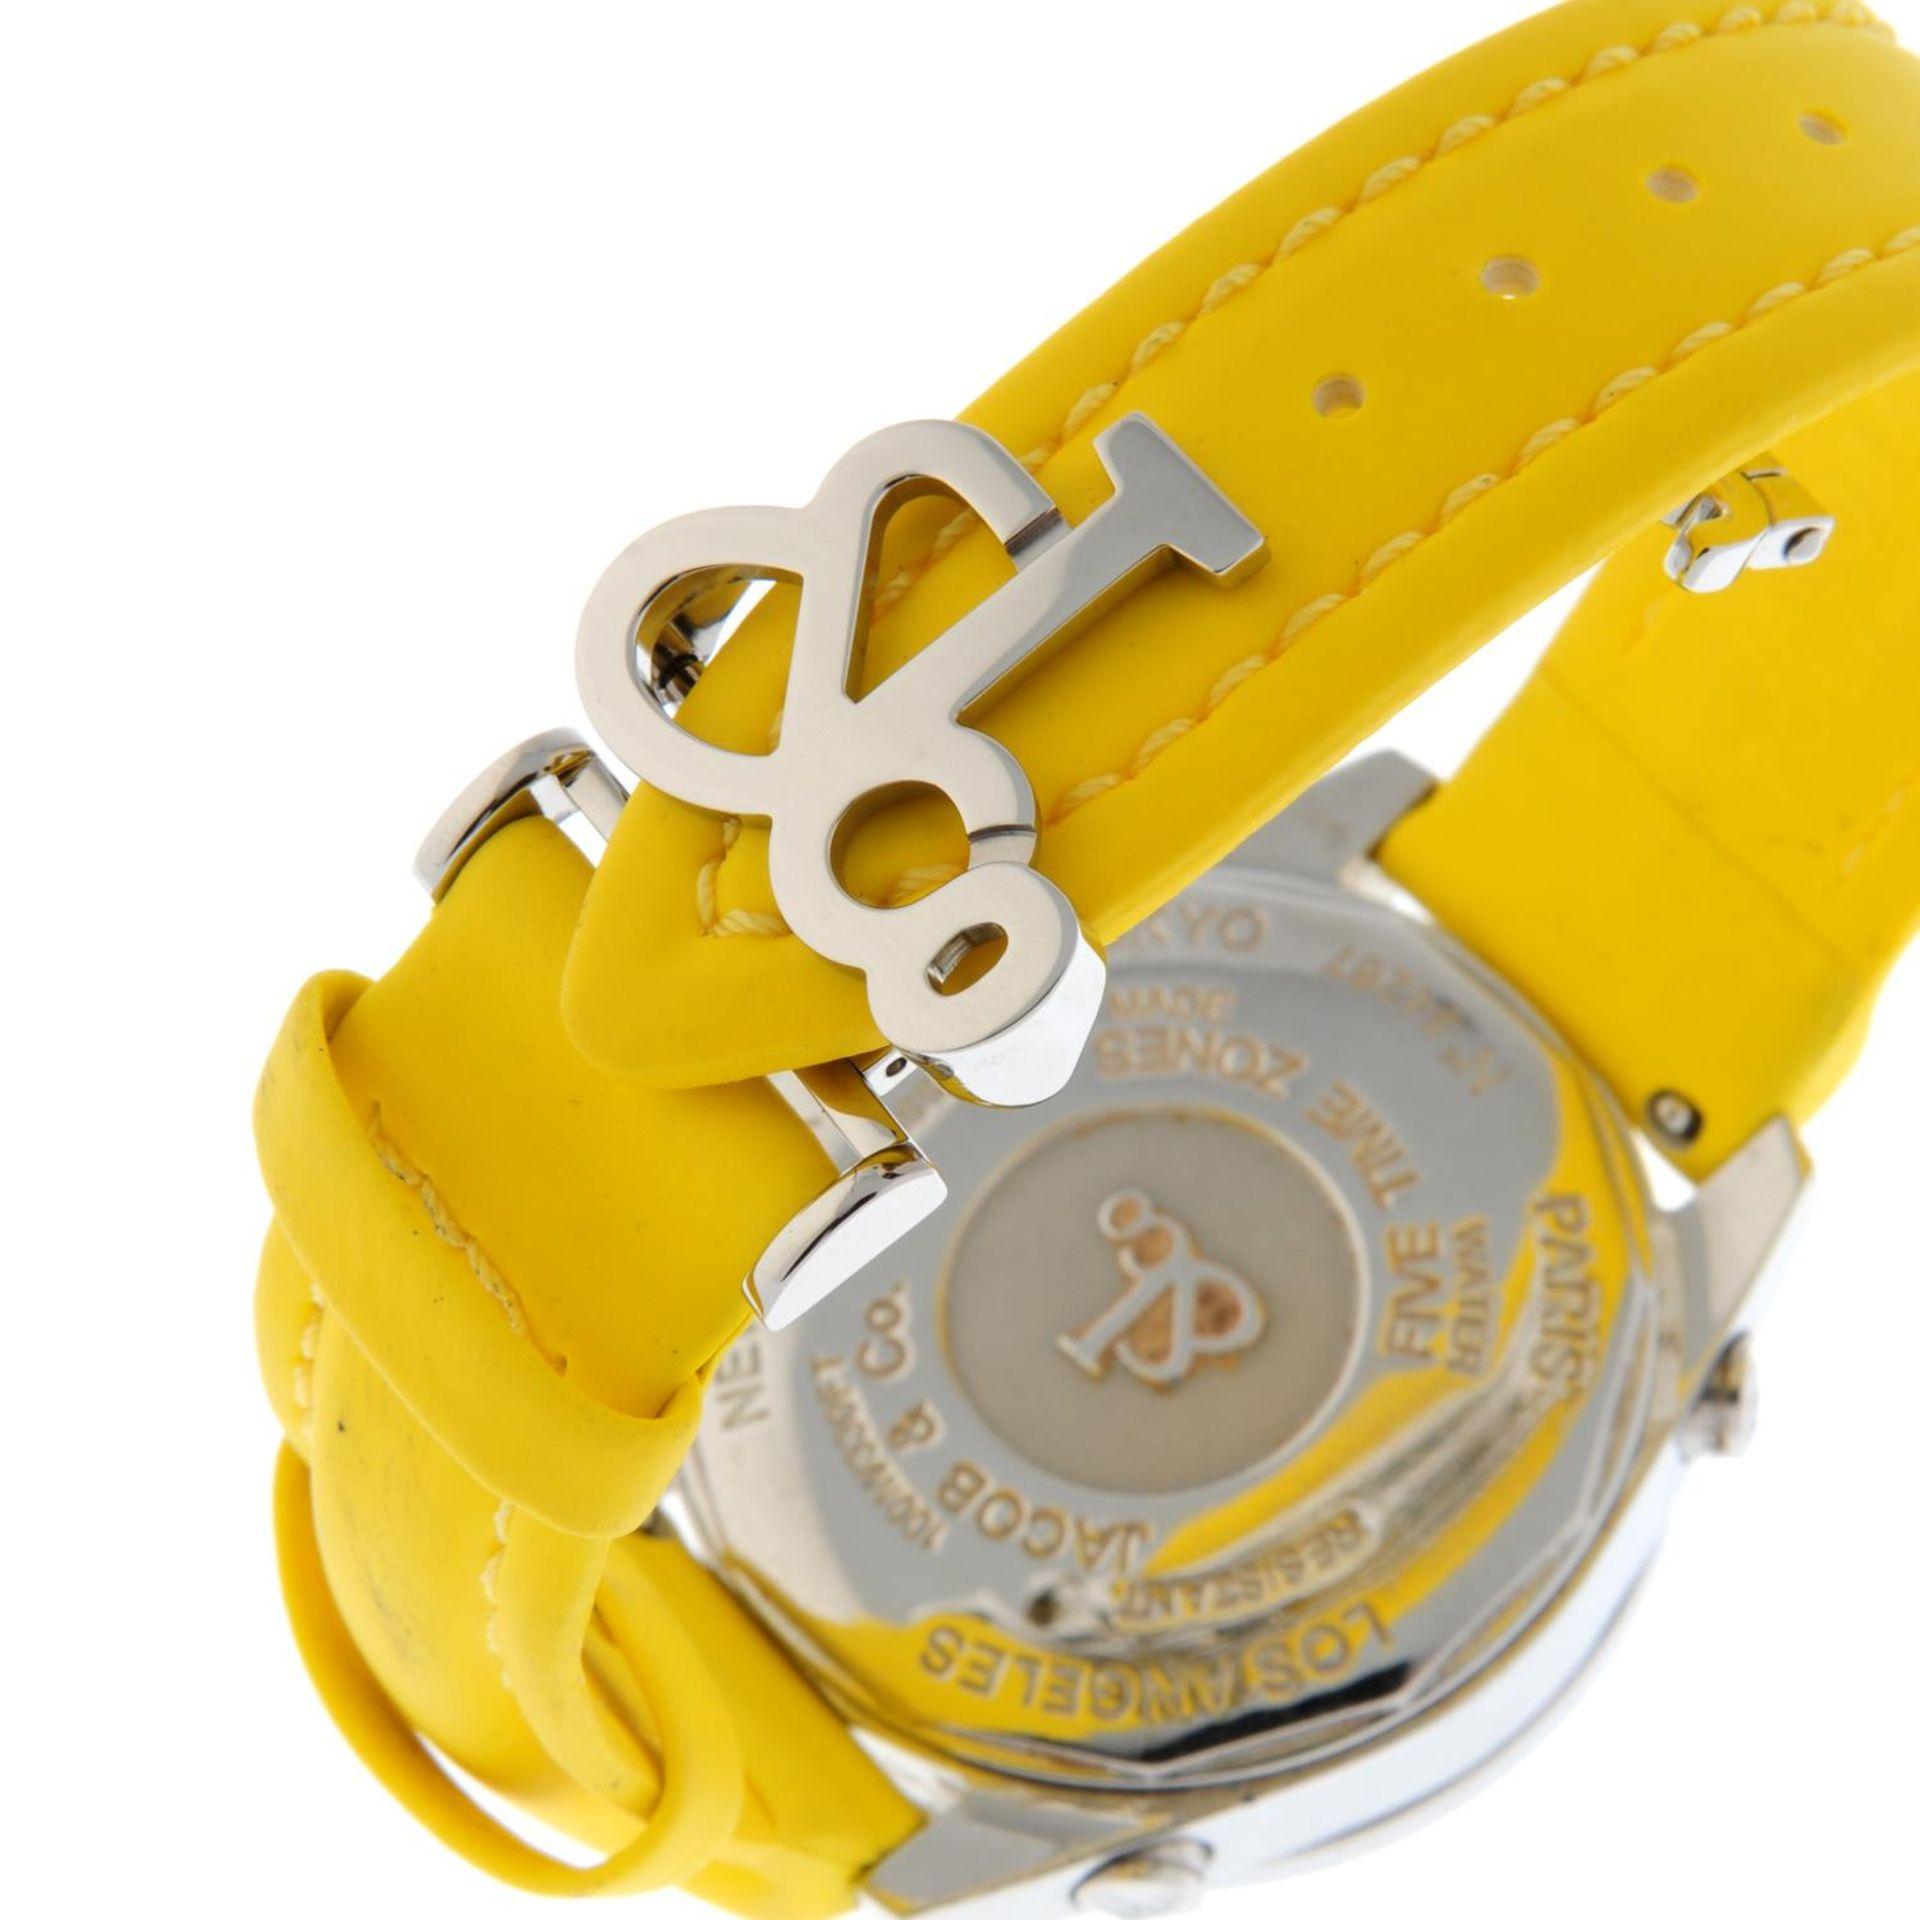 JACOB & CO. - a Five Time Zone wrist watch. - Bild 2 aus 8